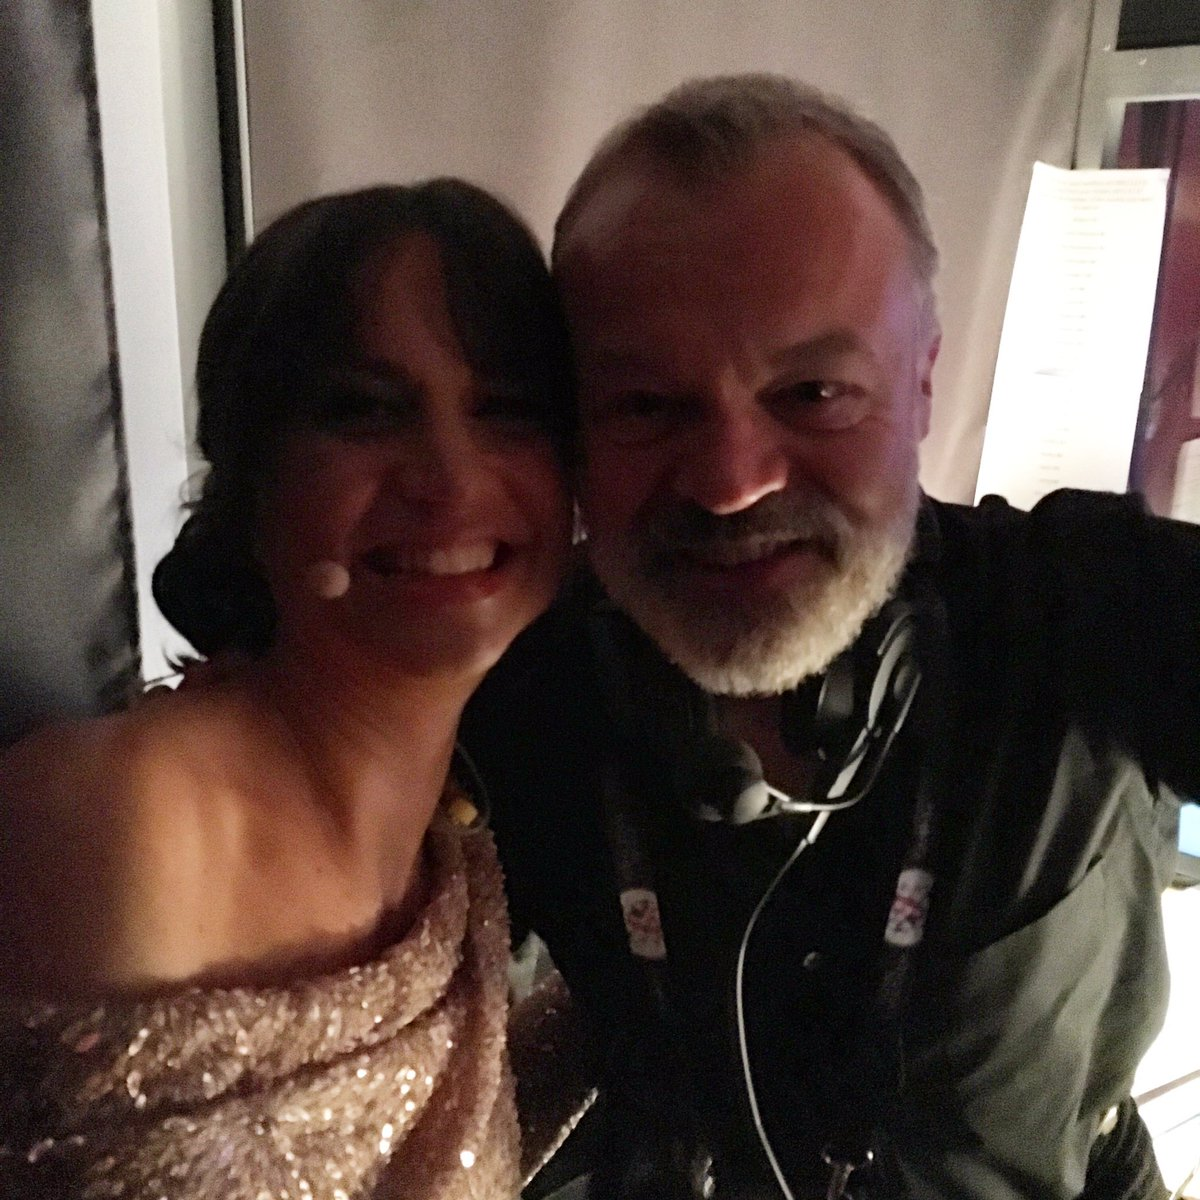 Edward Af Sillen On Twitter Reunited Backstage At Globen Two Brilliant Stars Petramedesweden And Grahnort